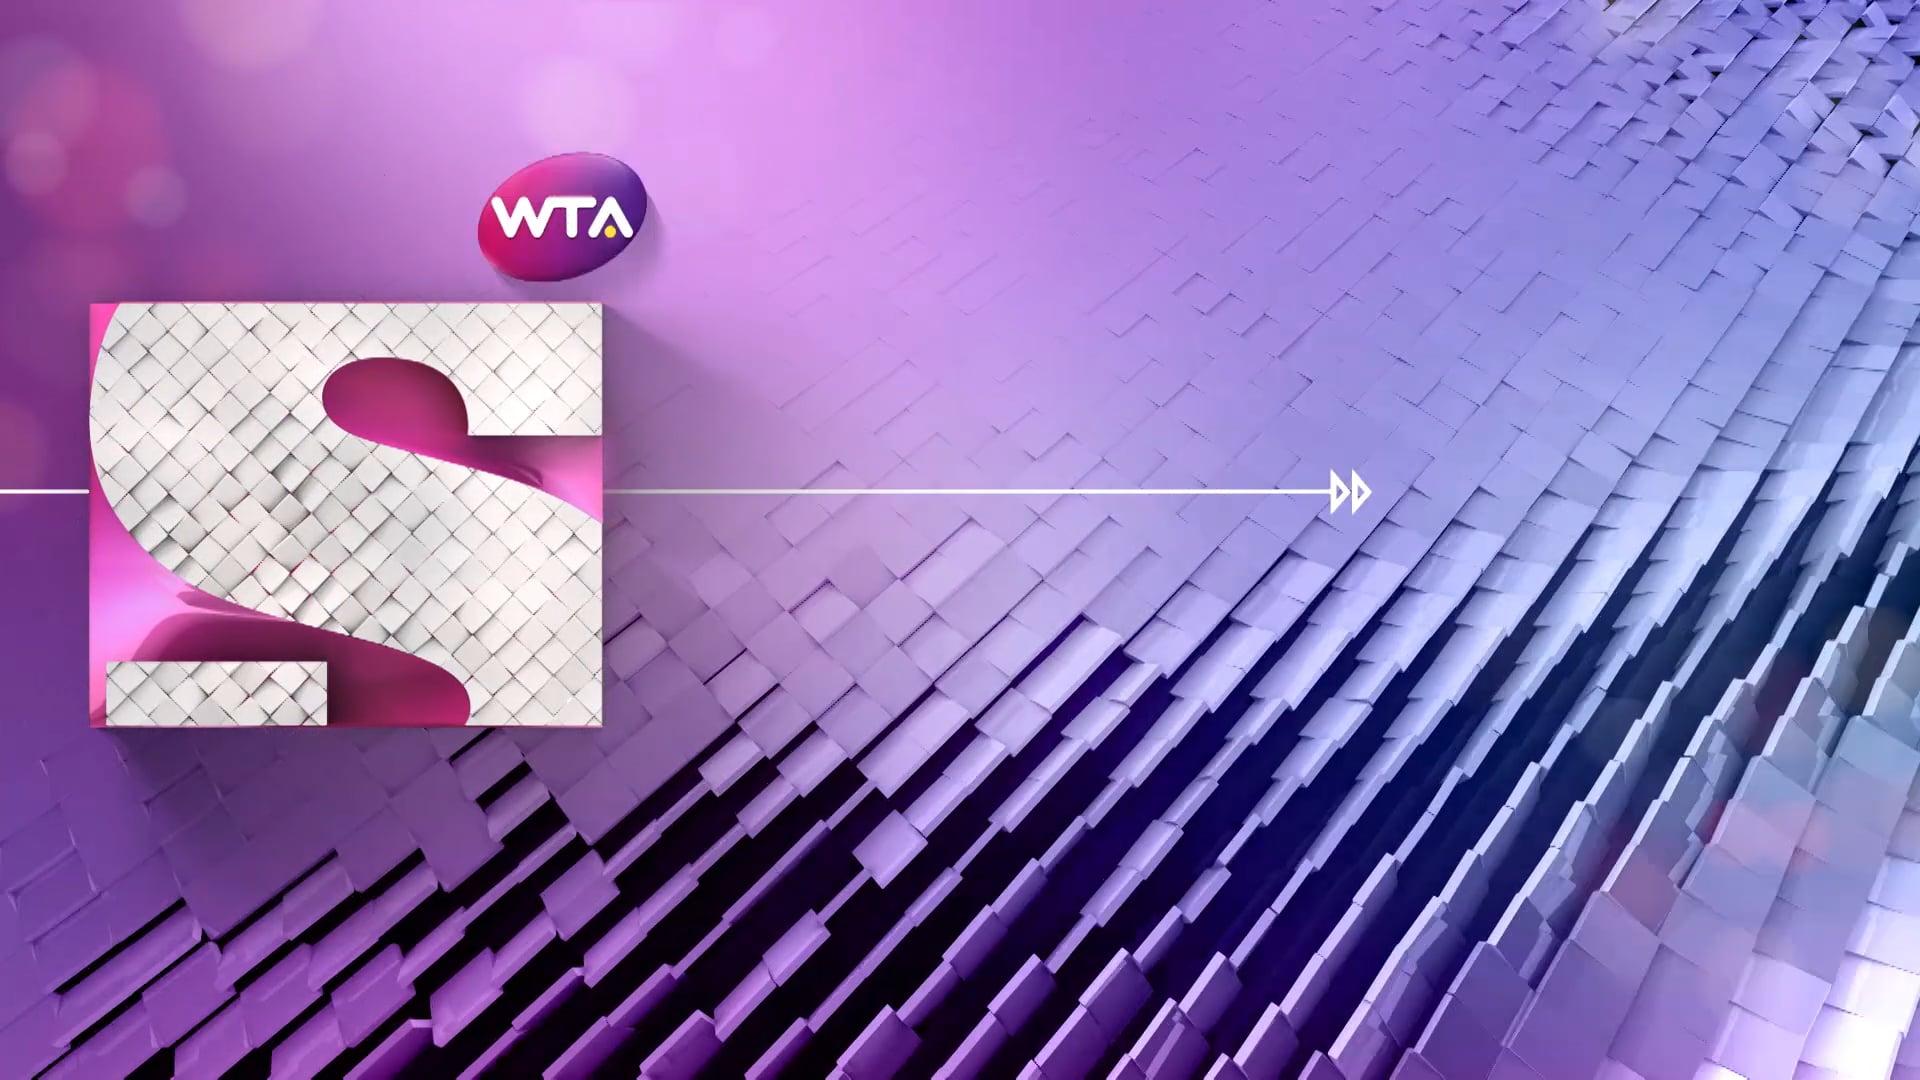 WTA – STUTTGART SEMI FINALS